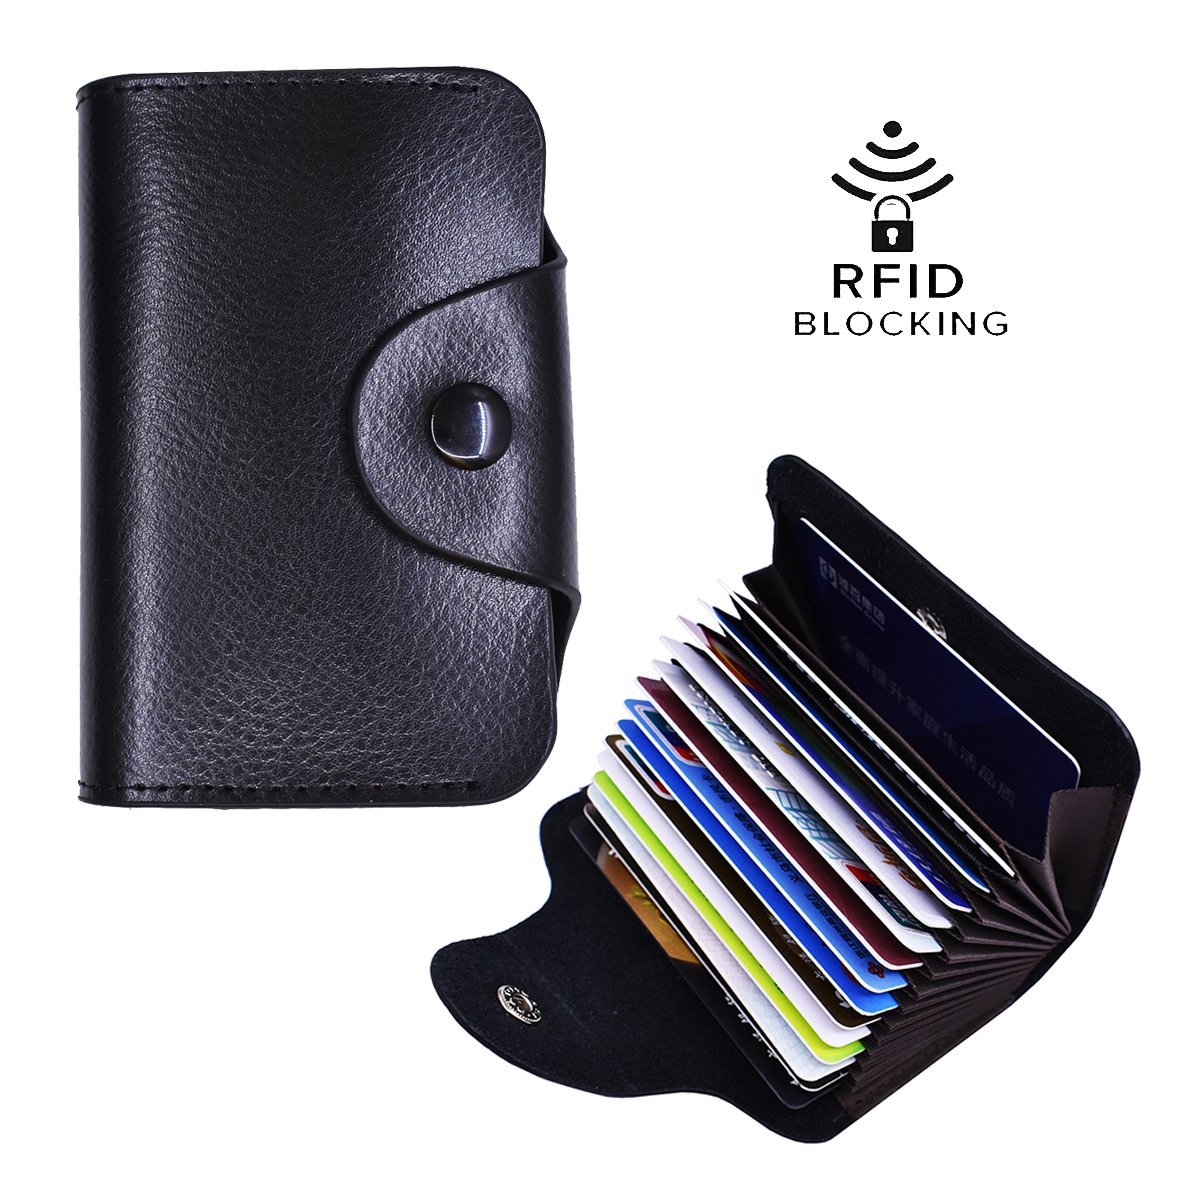 Women's Genuine Leather RFID Blocking Wallet Black Multi Card Organizer Small Purse Mini Business Card Case-6 Colors (Black)